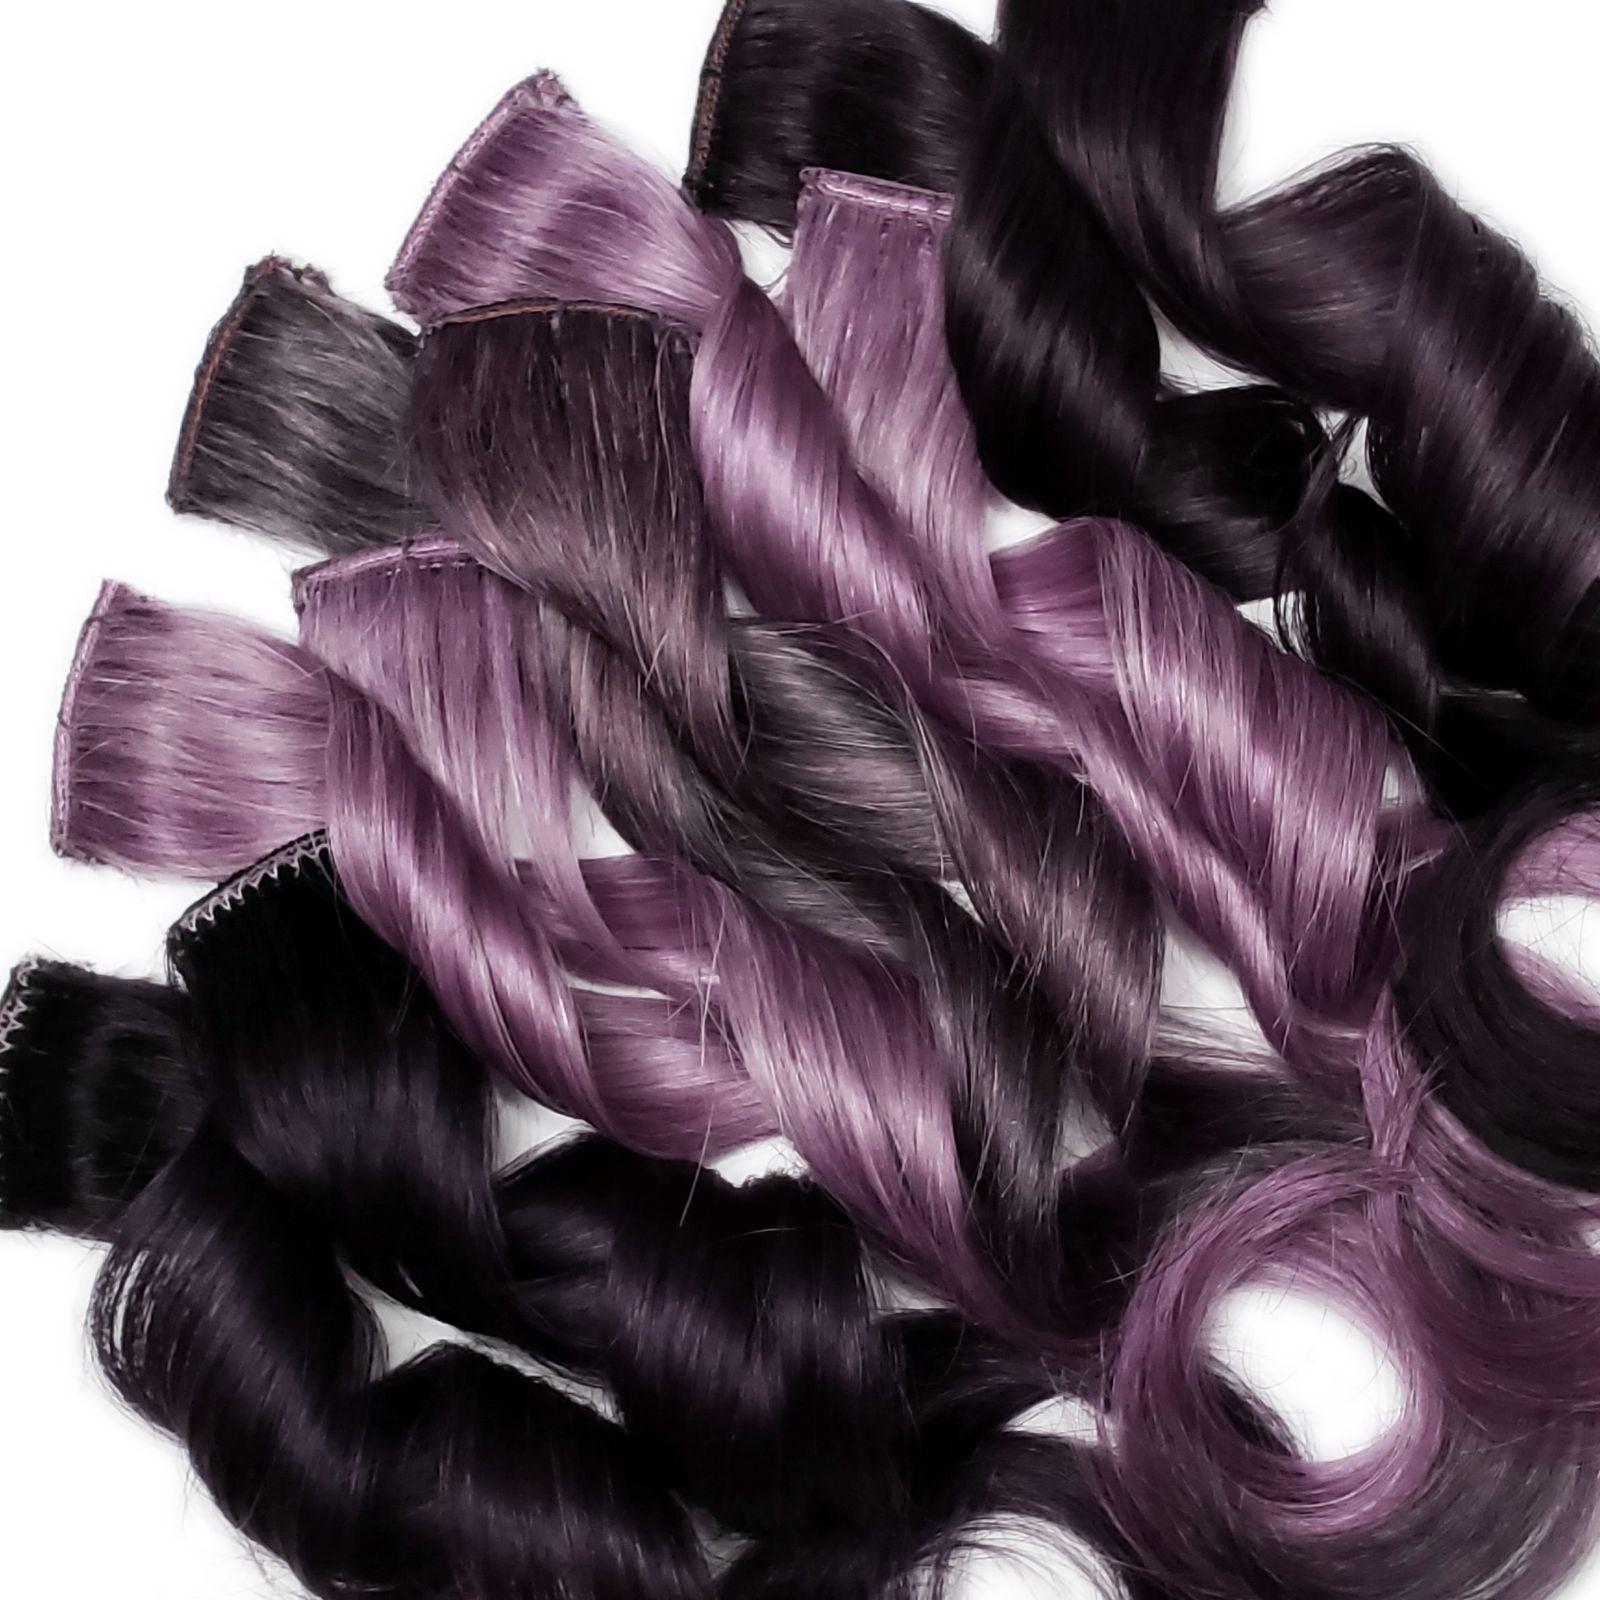 Purple 100% human hair extensions